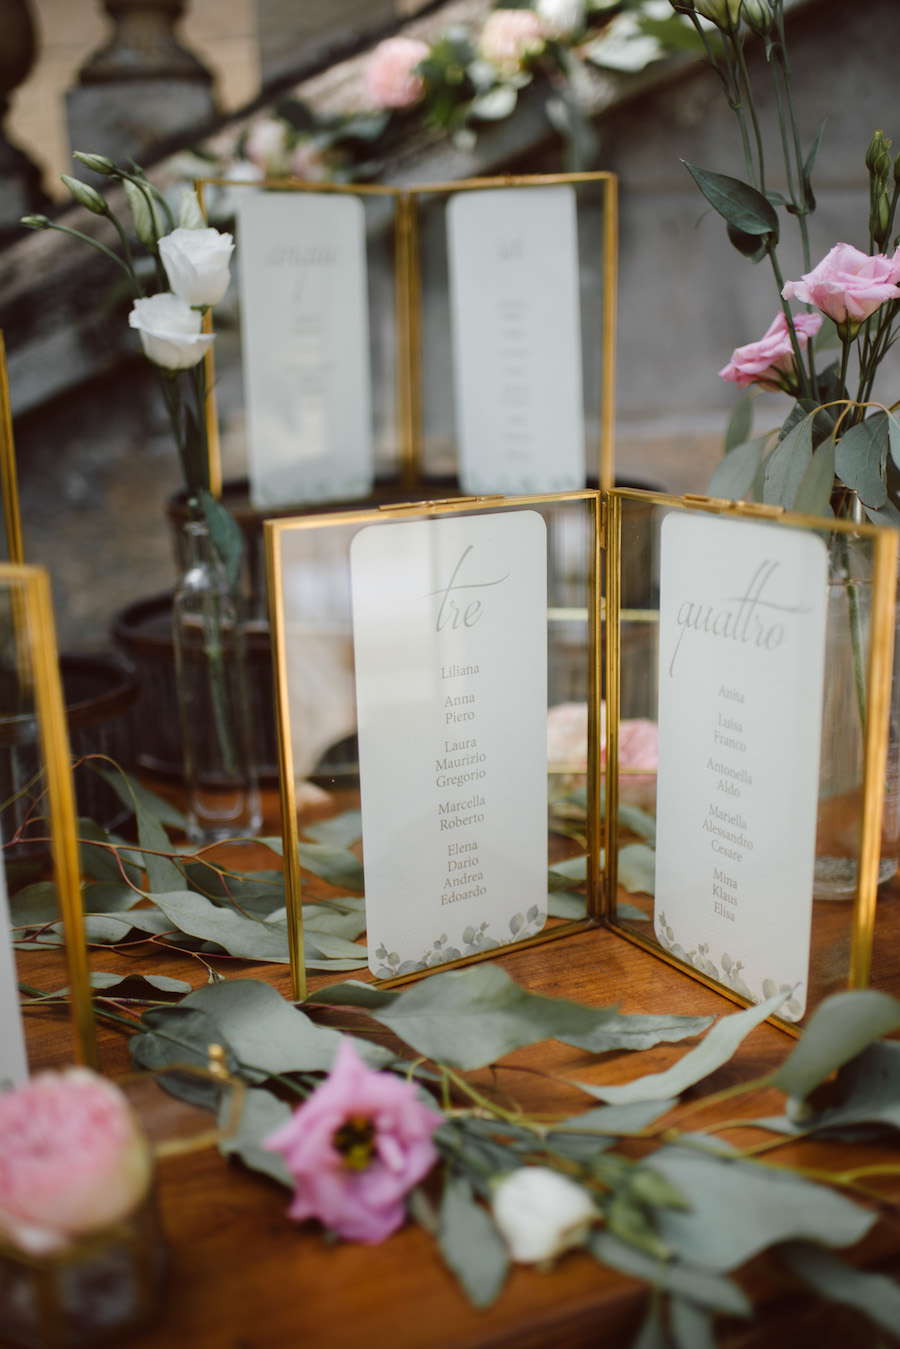 tableau de mariage con cornici oro